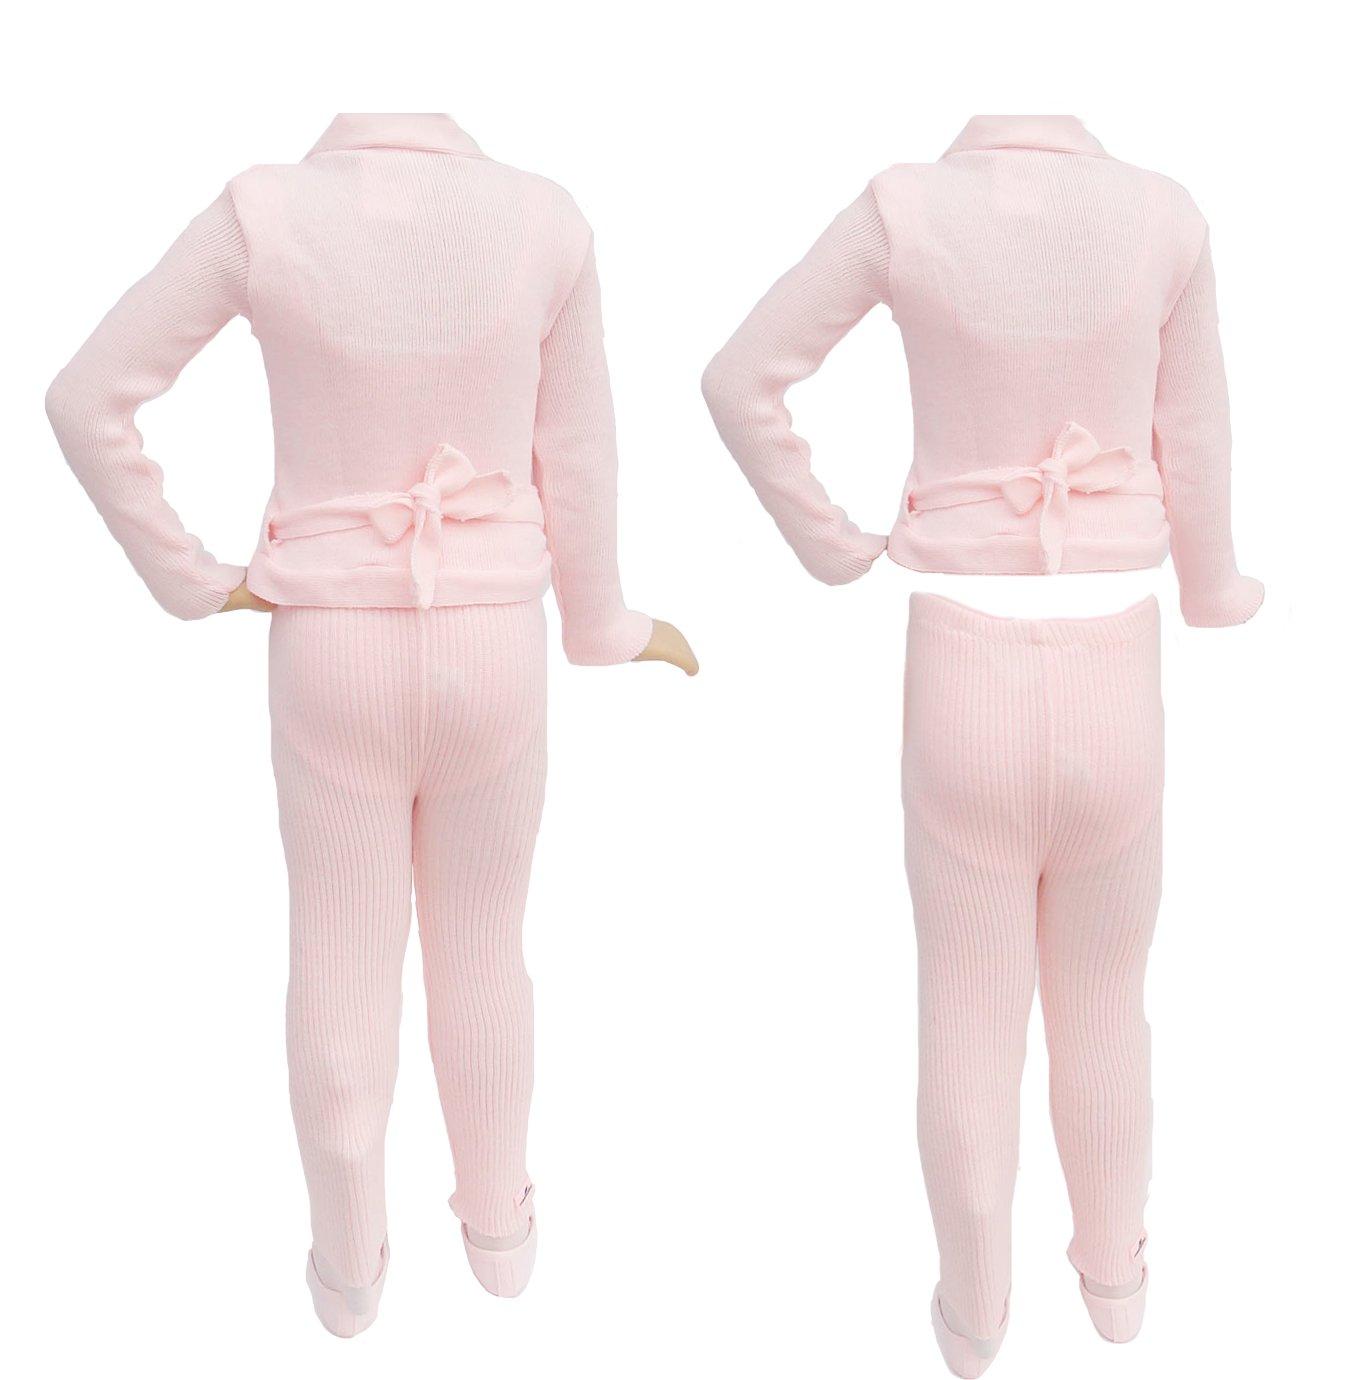 Ballet lã conjunto costas 2 imagens .jpg